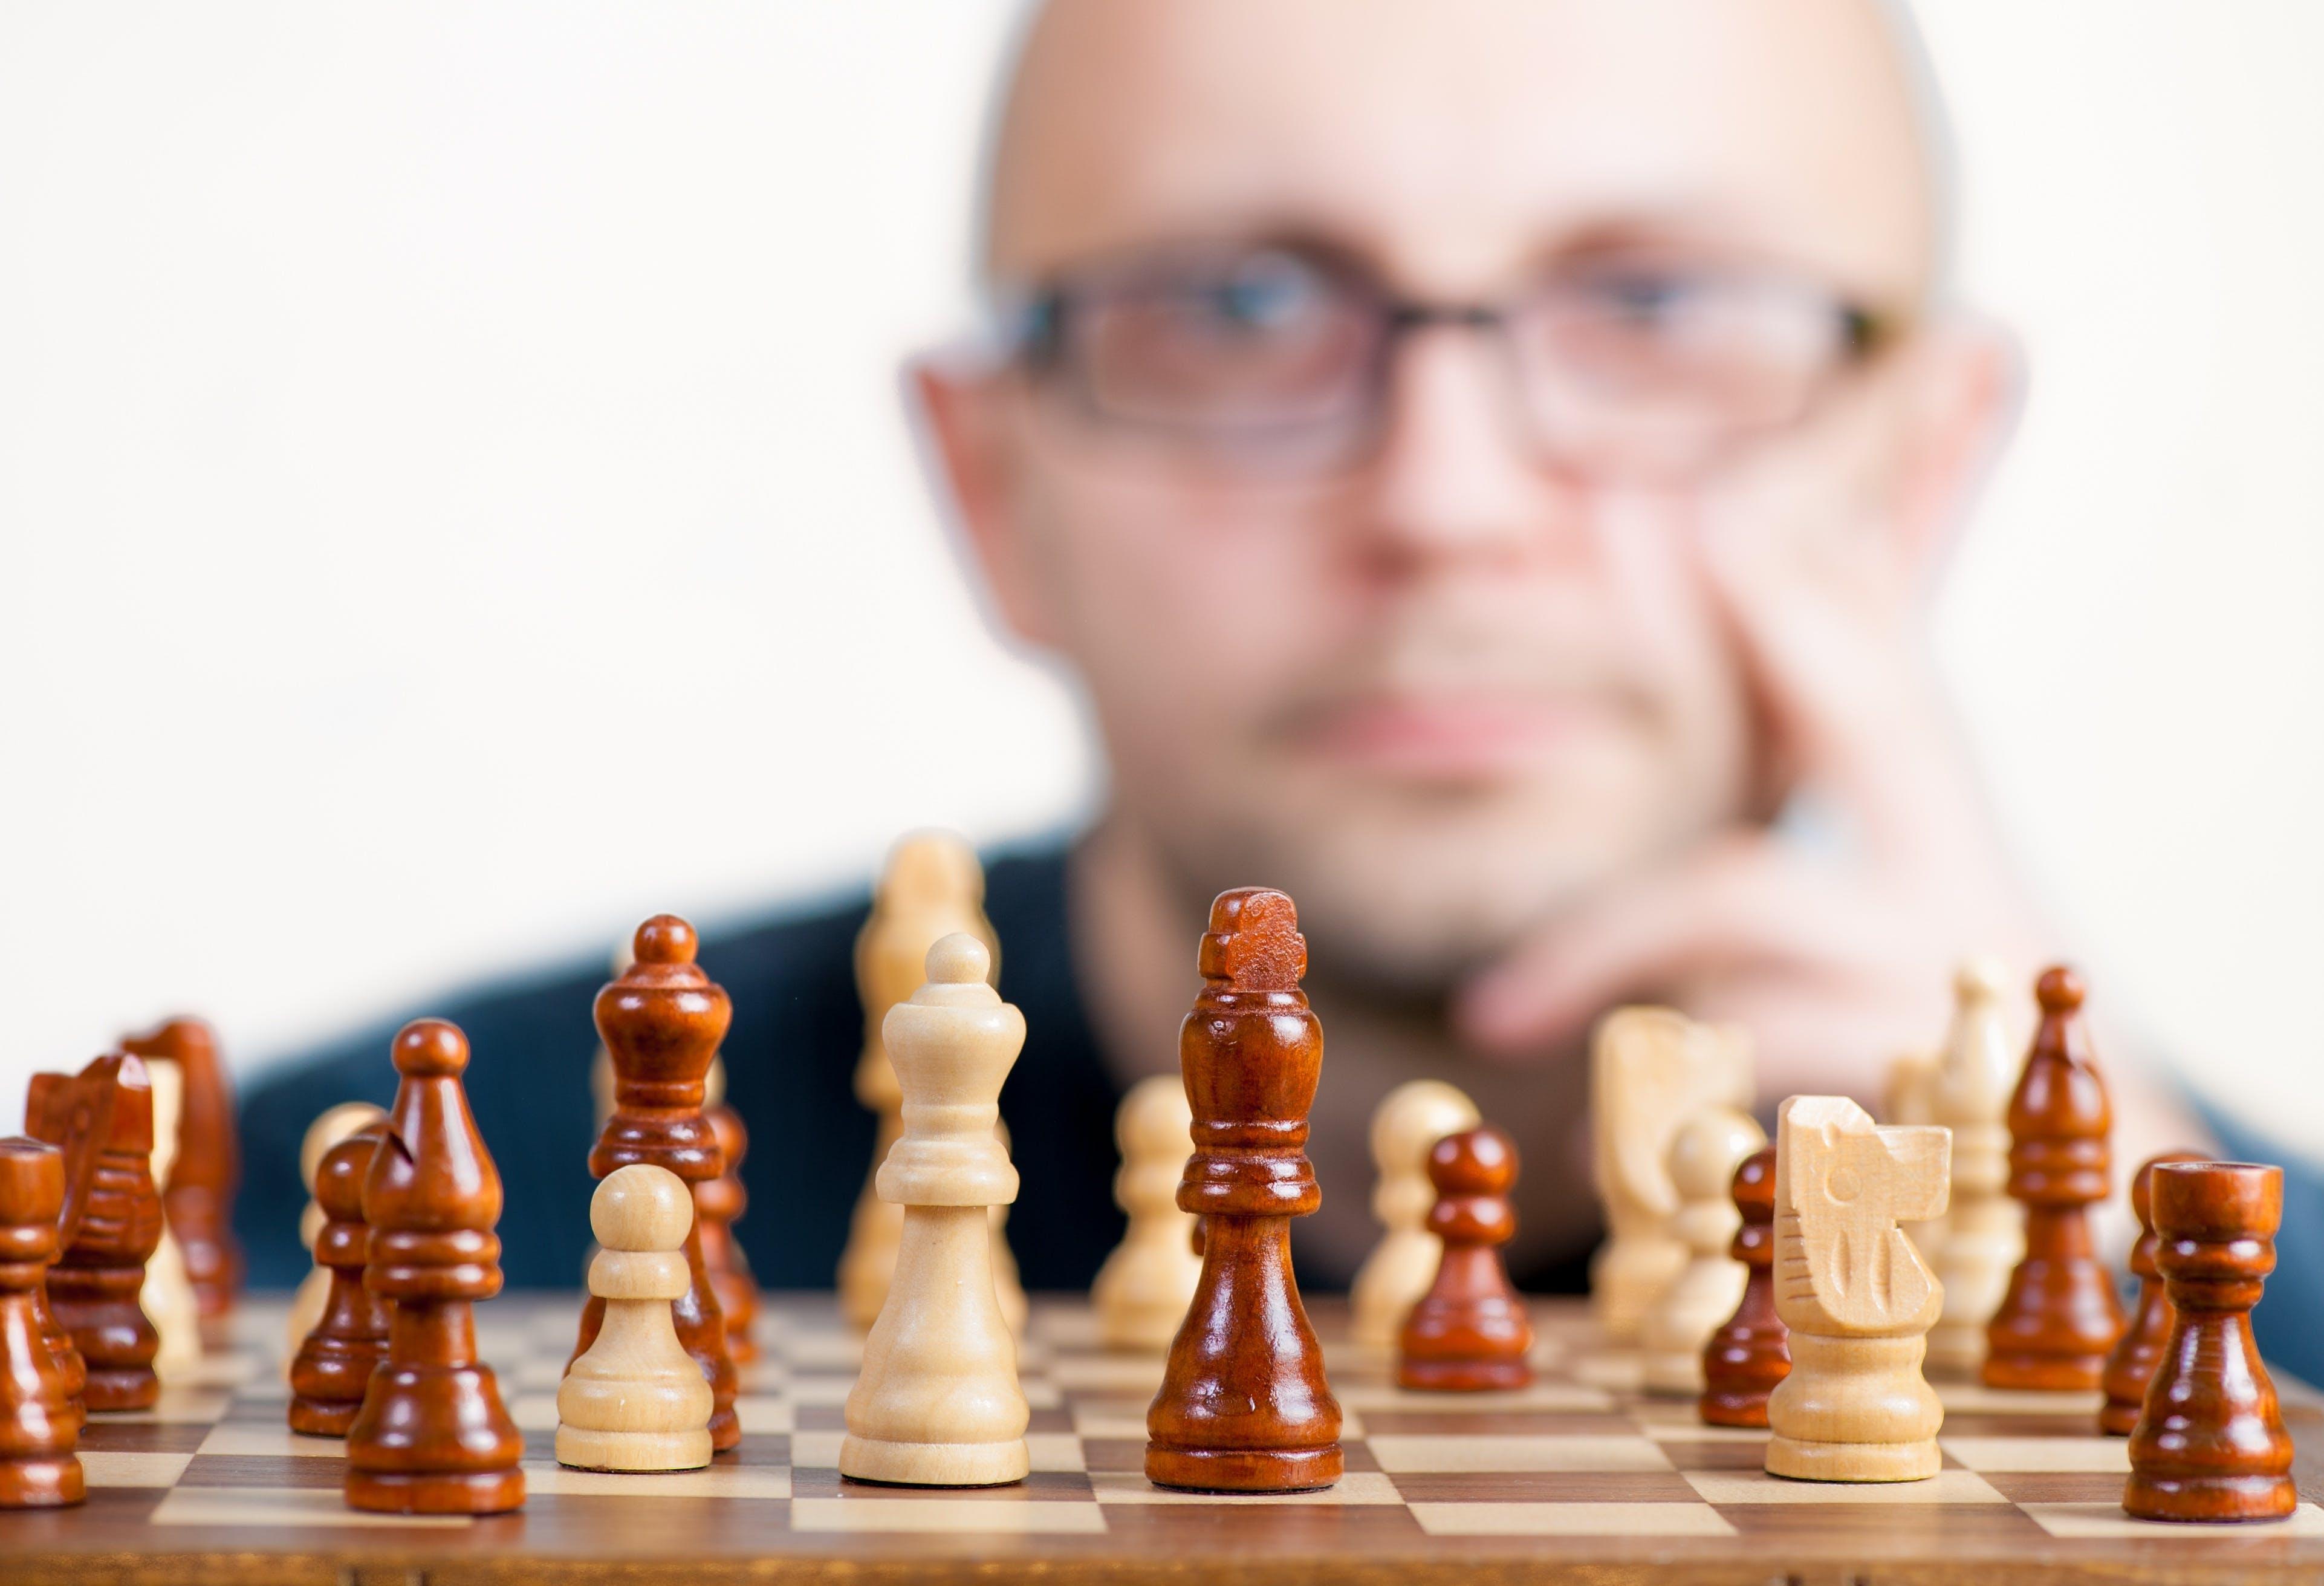 Titelbild-Strategie-Schach-Stratege-Mikromanager-Mann-1080533-pixabay-jarmoluk